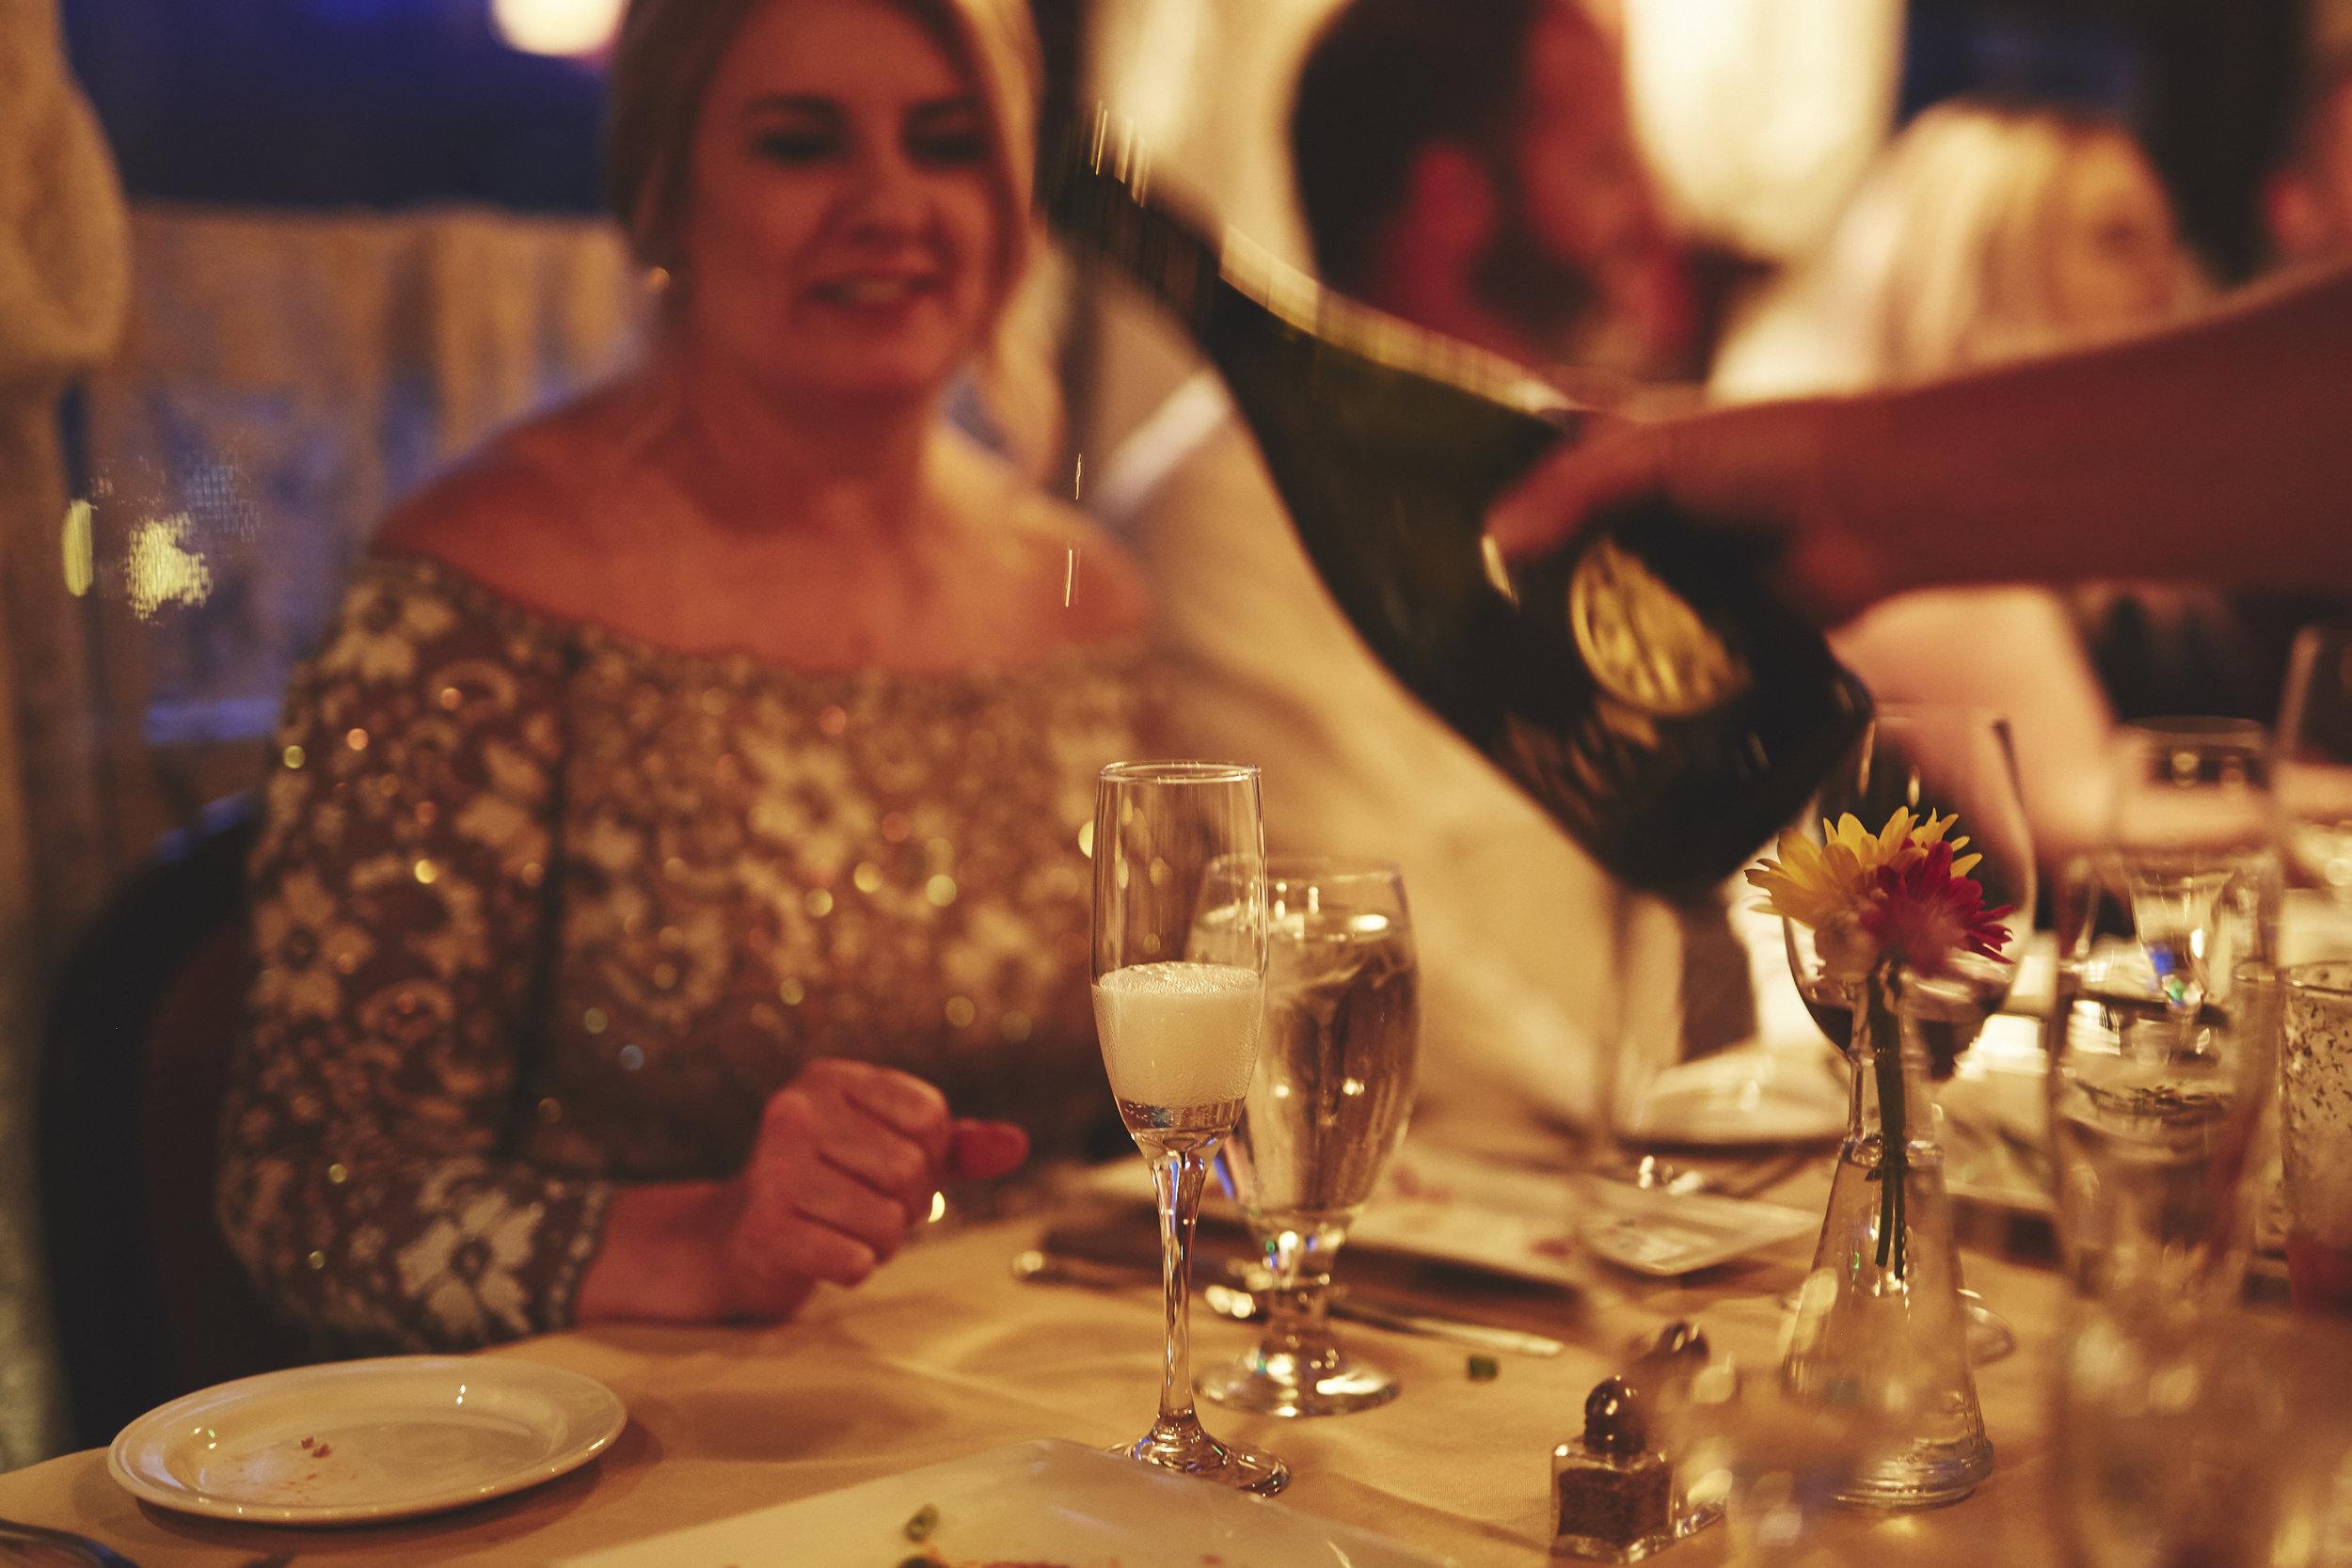 Lindsay & Patrick - brenromangphoto - 6I5A4074.jpg